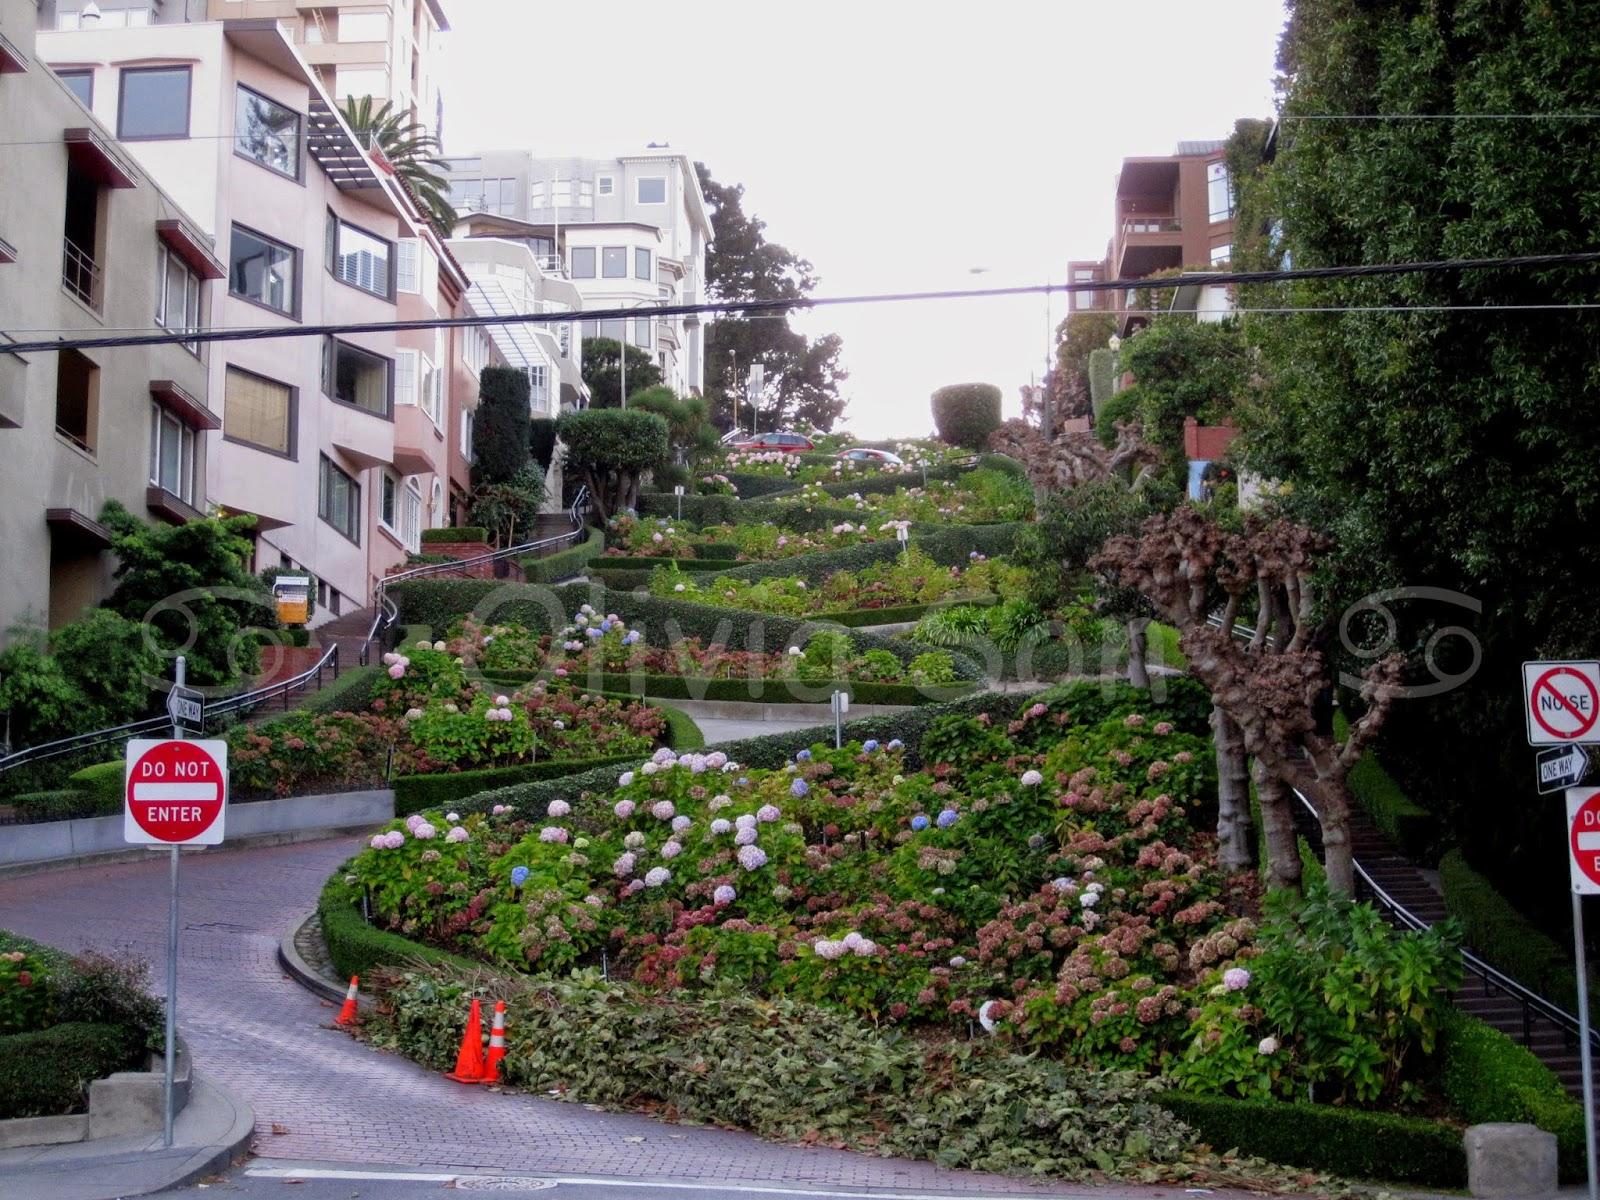 lombard street san francisco, californie, usa